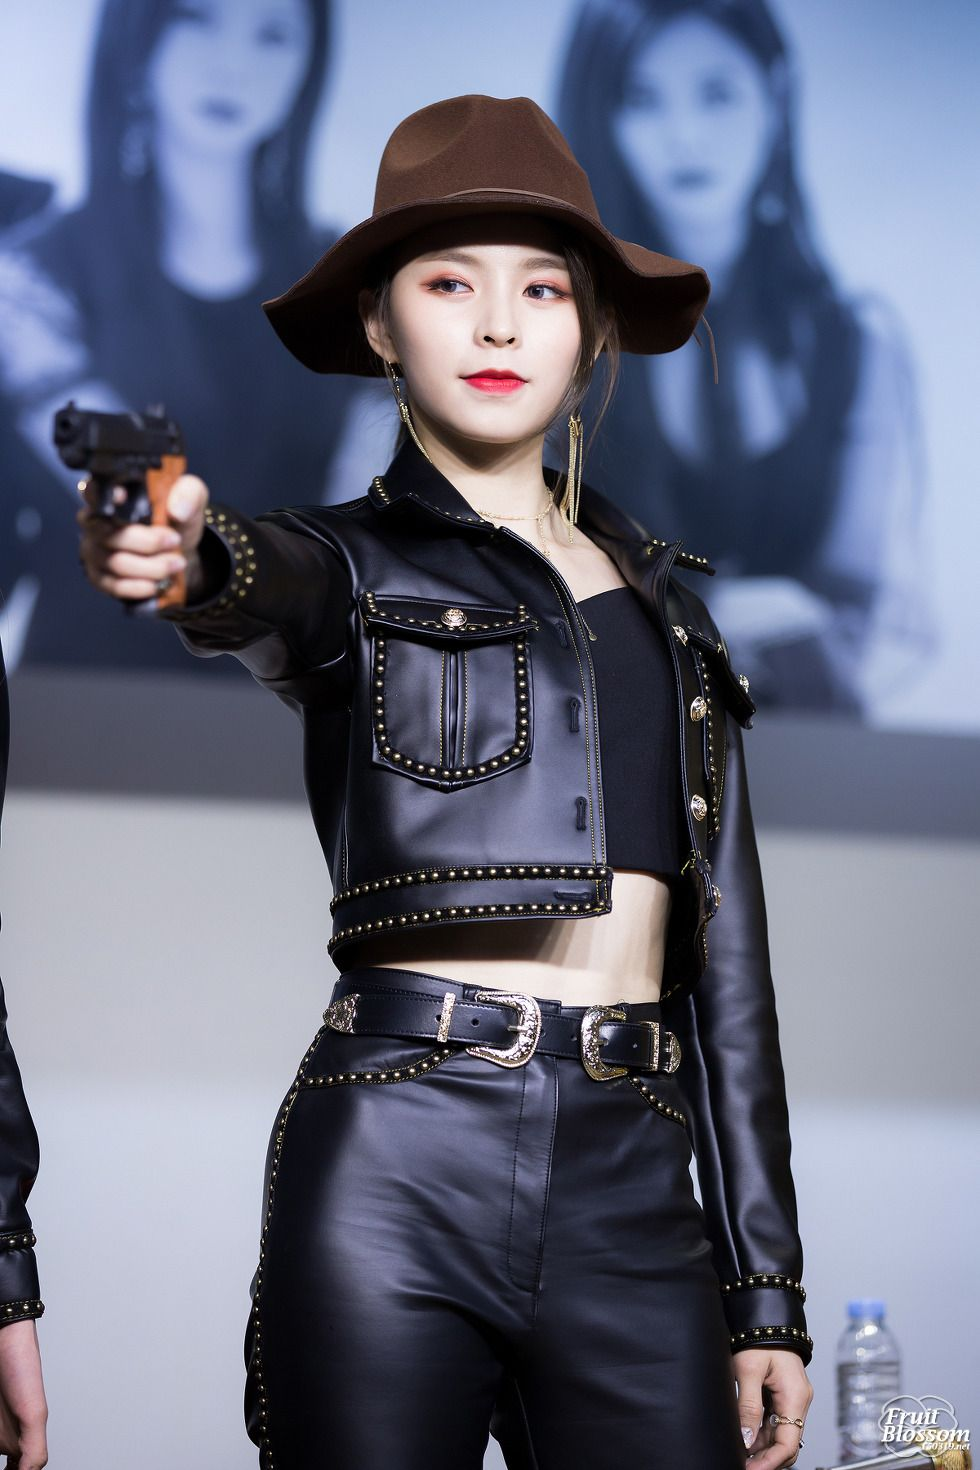 Dedicated To Female Kpop Idols Kpop Outfits Asian Fashion Female